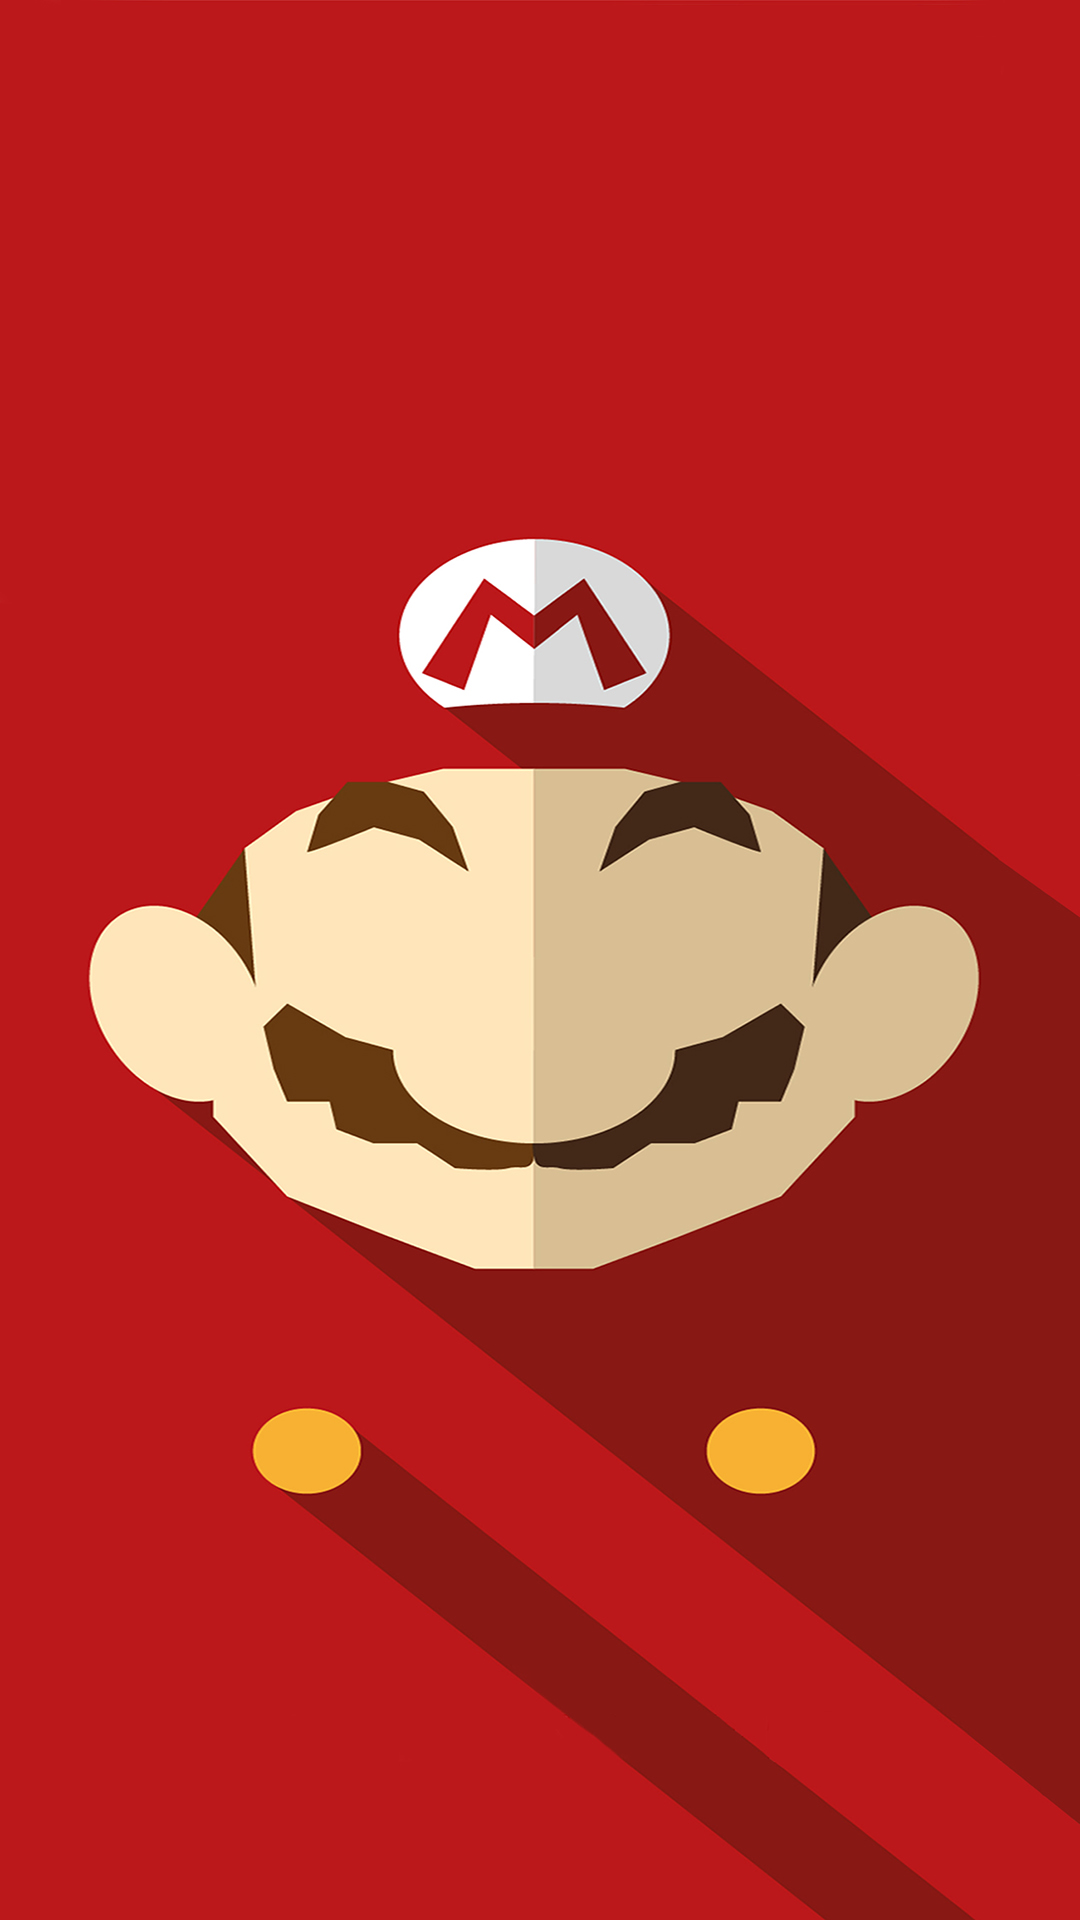 Super Mario Wallpapers Central